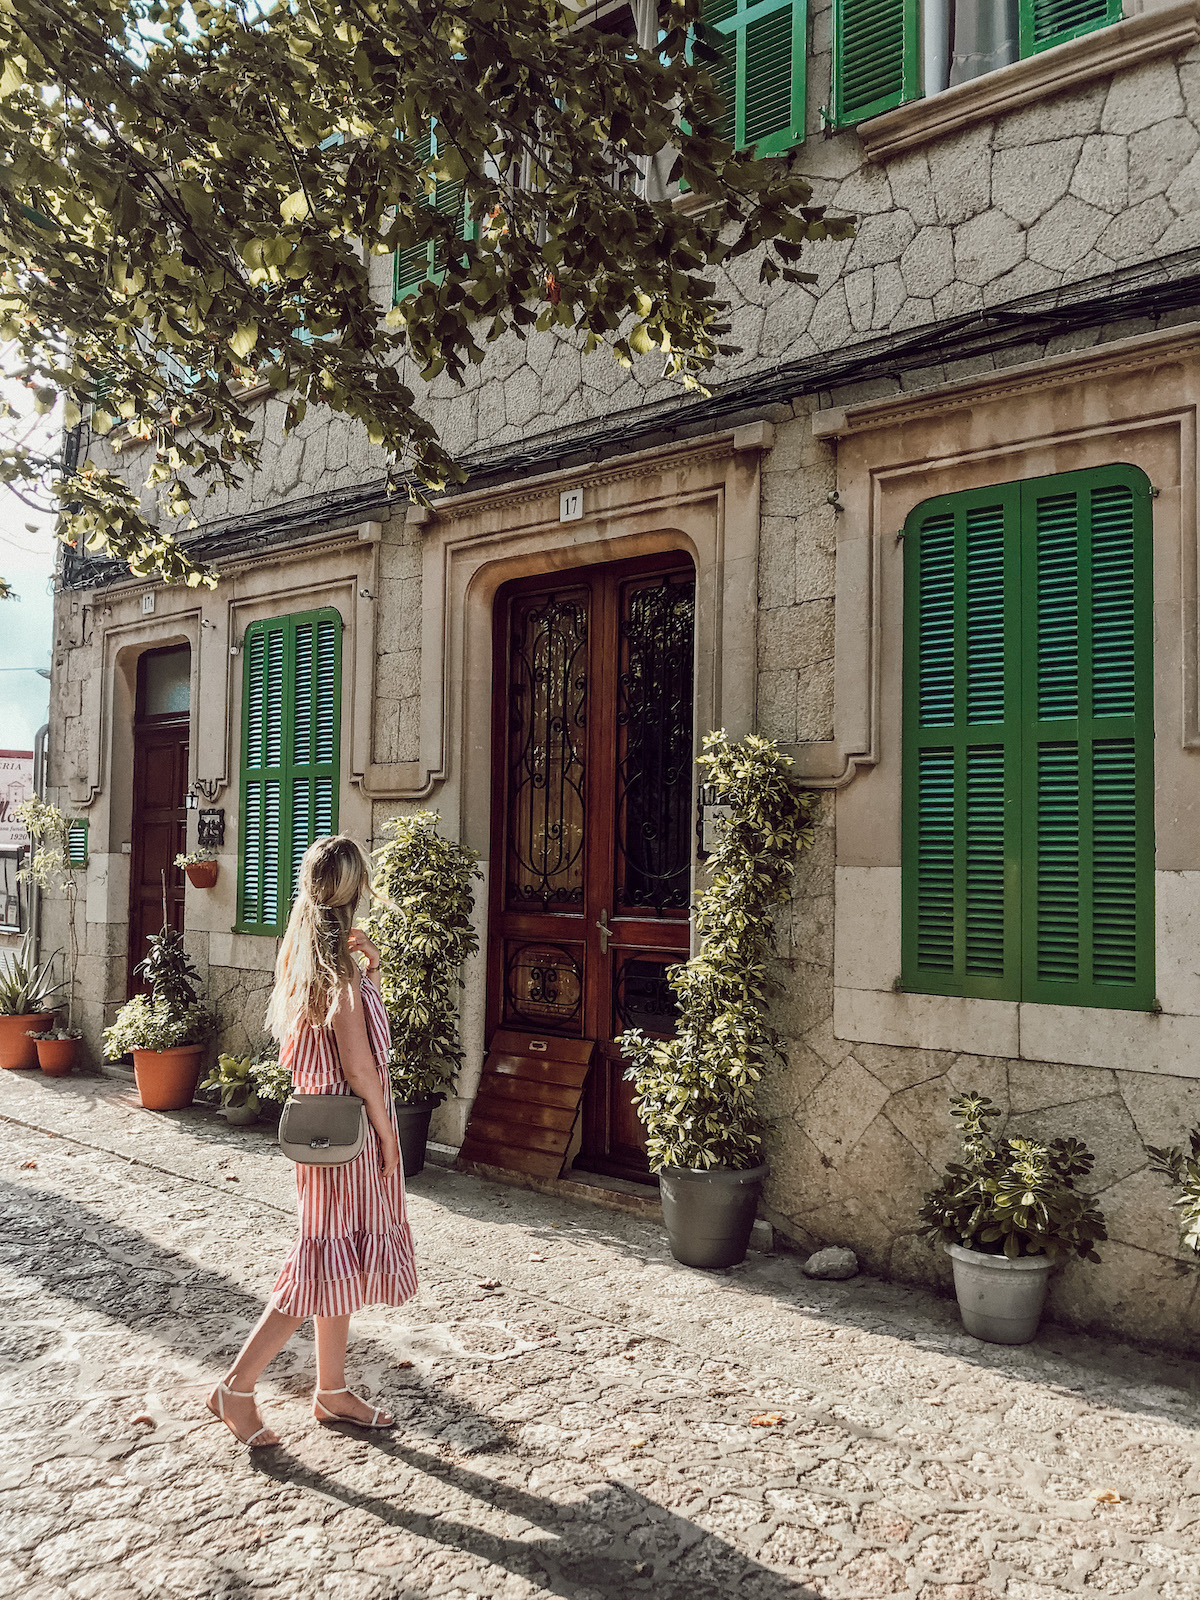 Sehenswerte Orte Mallorca Dörfer Städte Traveldiary Reisetipps Empfehlung Travelblog Bergdorf Valldemossa